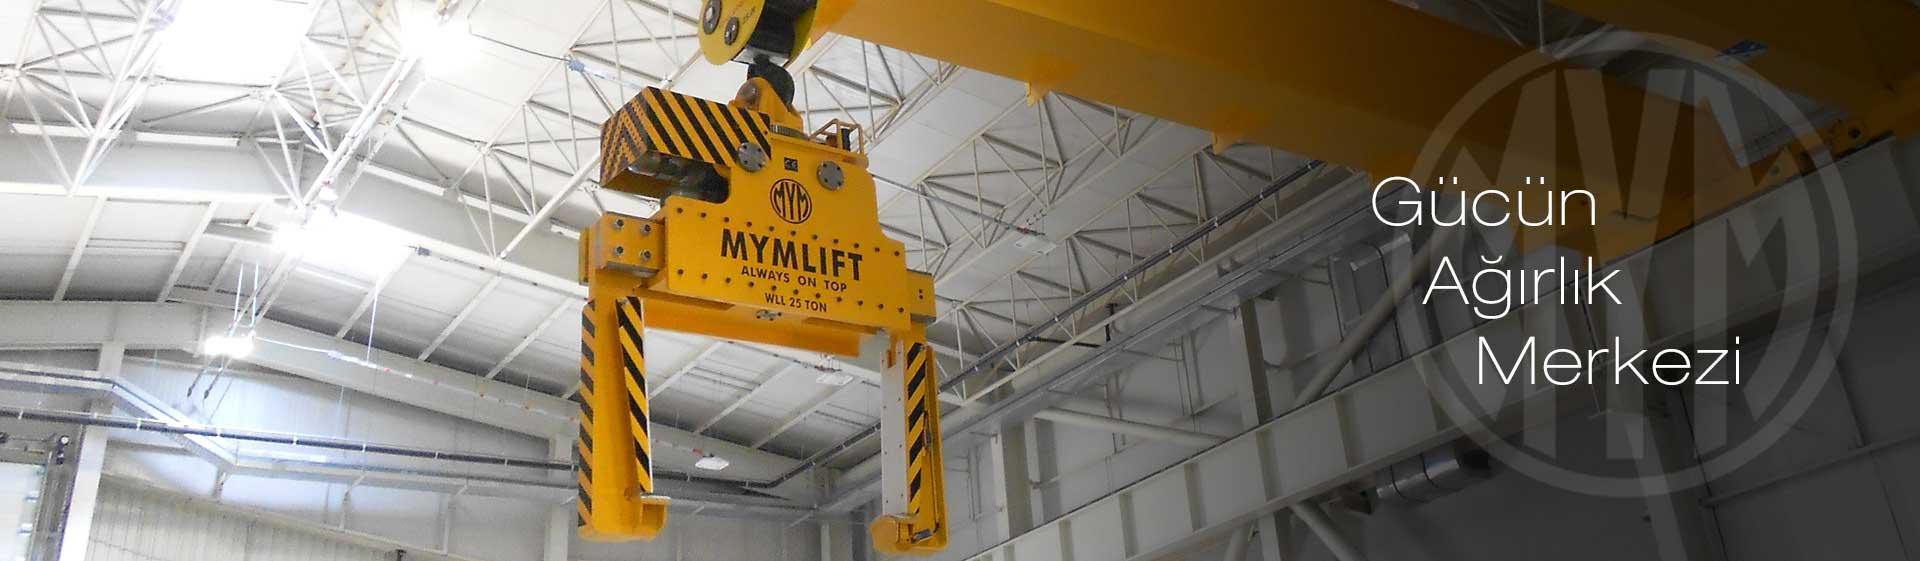 MYM Lift 4